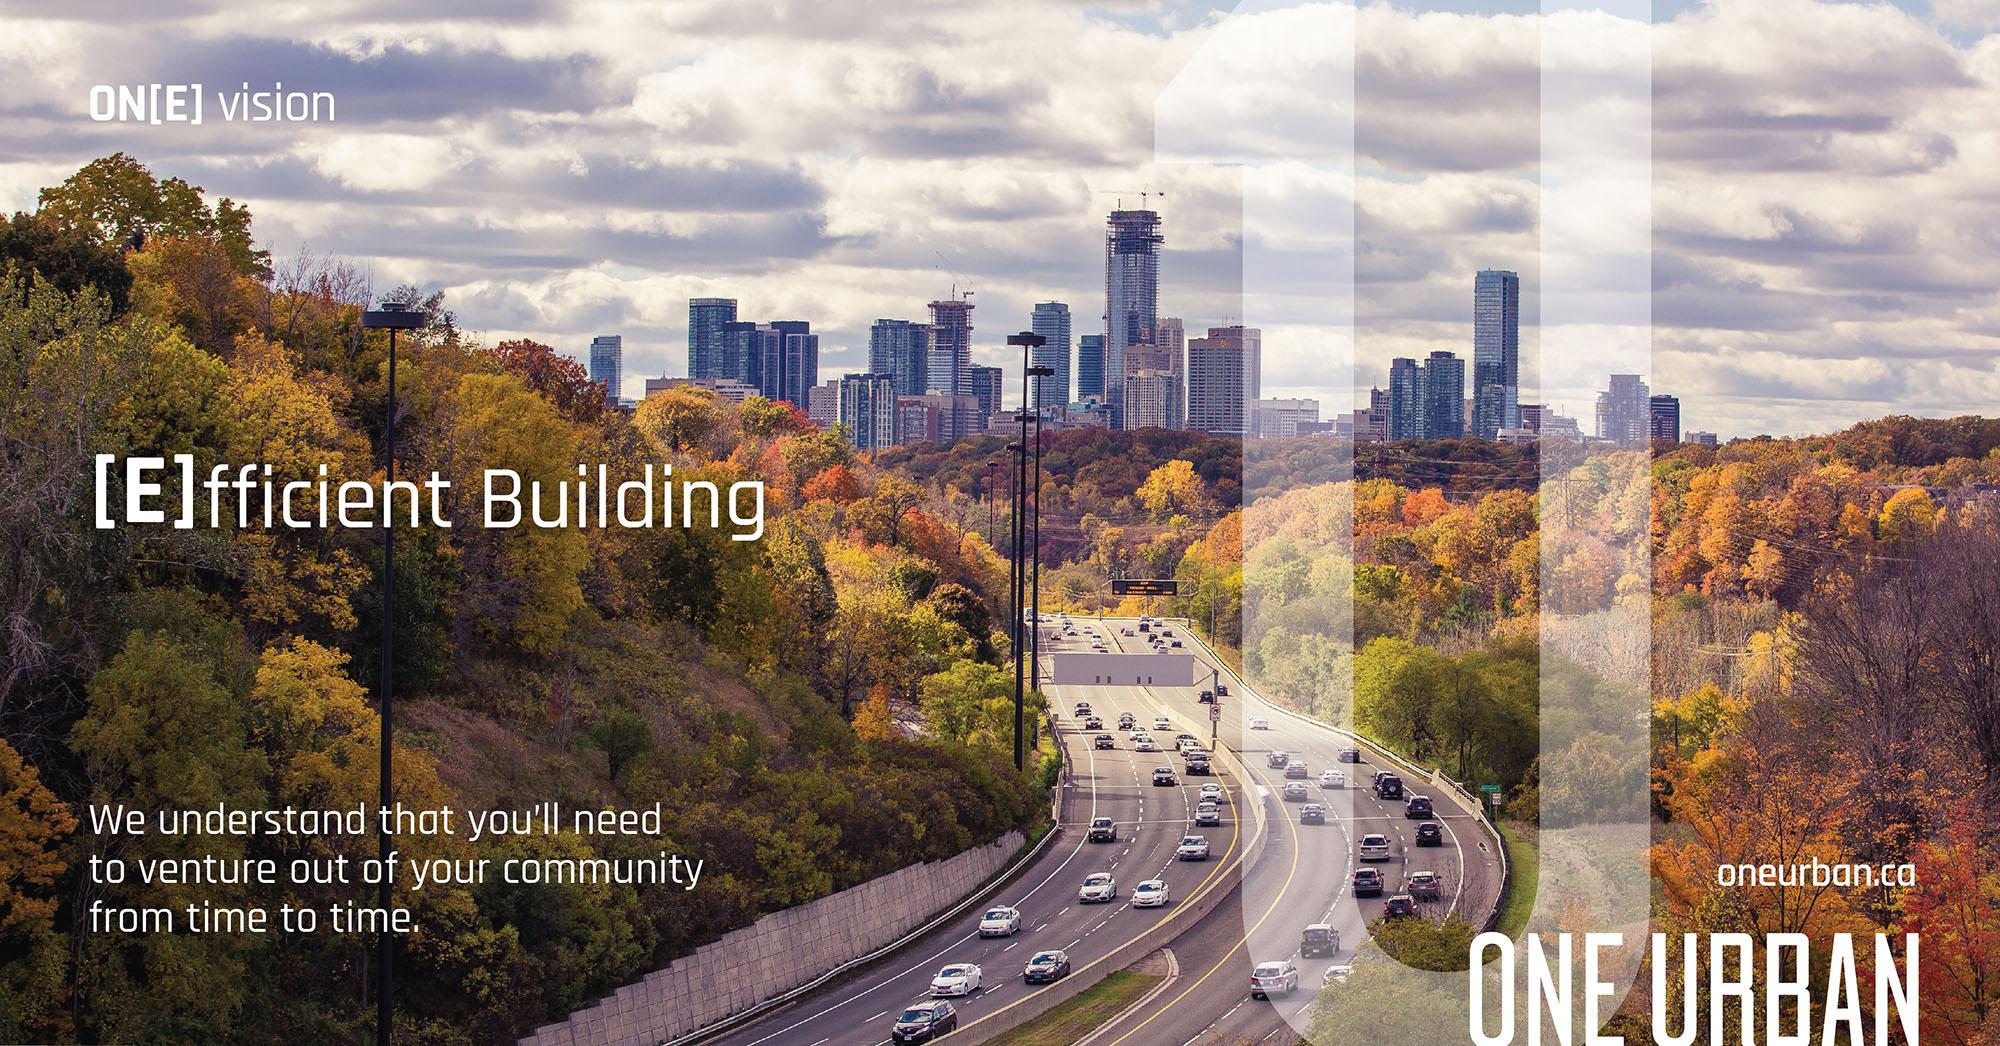 One-Urban-Efficient-Building.jpg